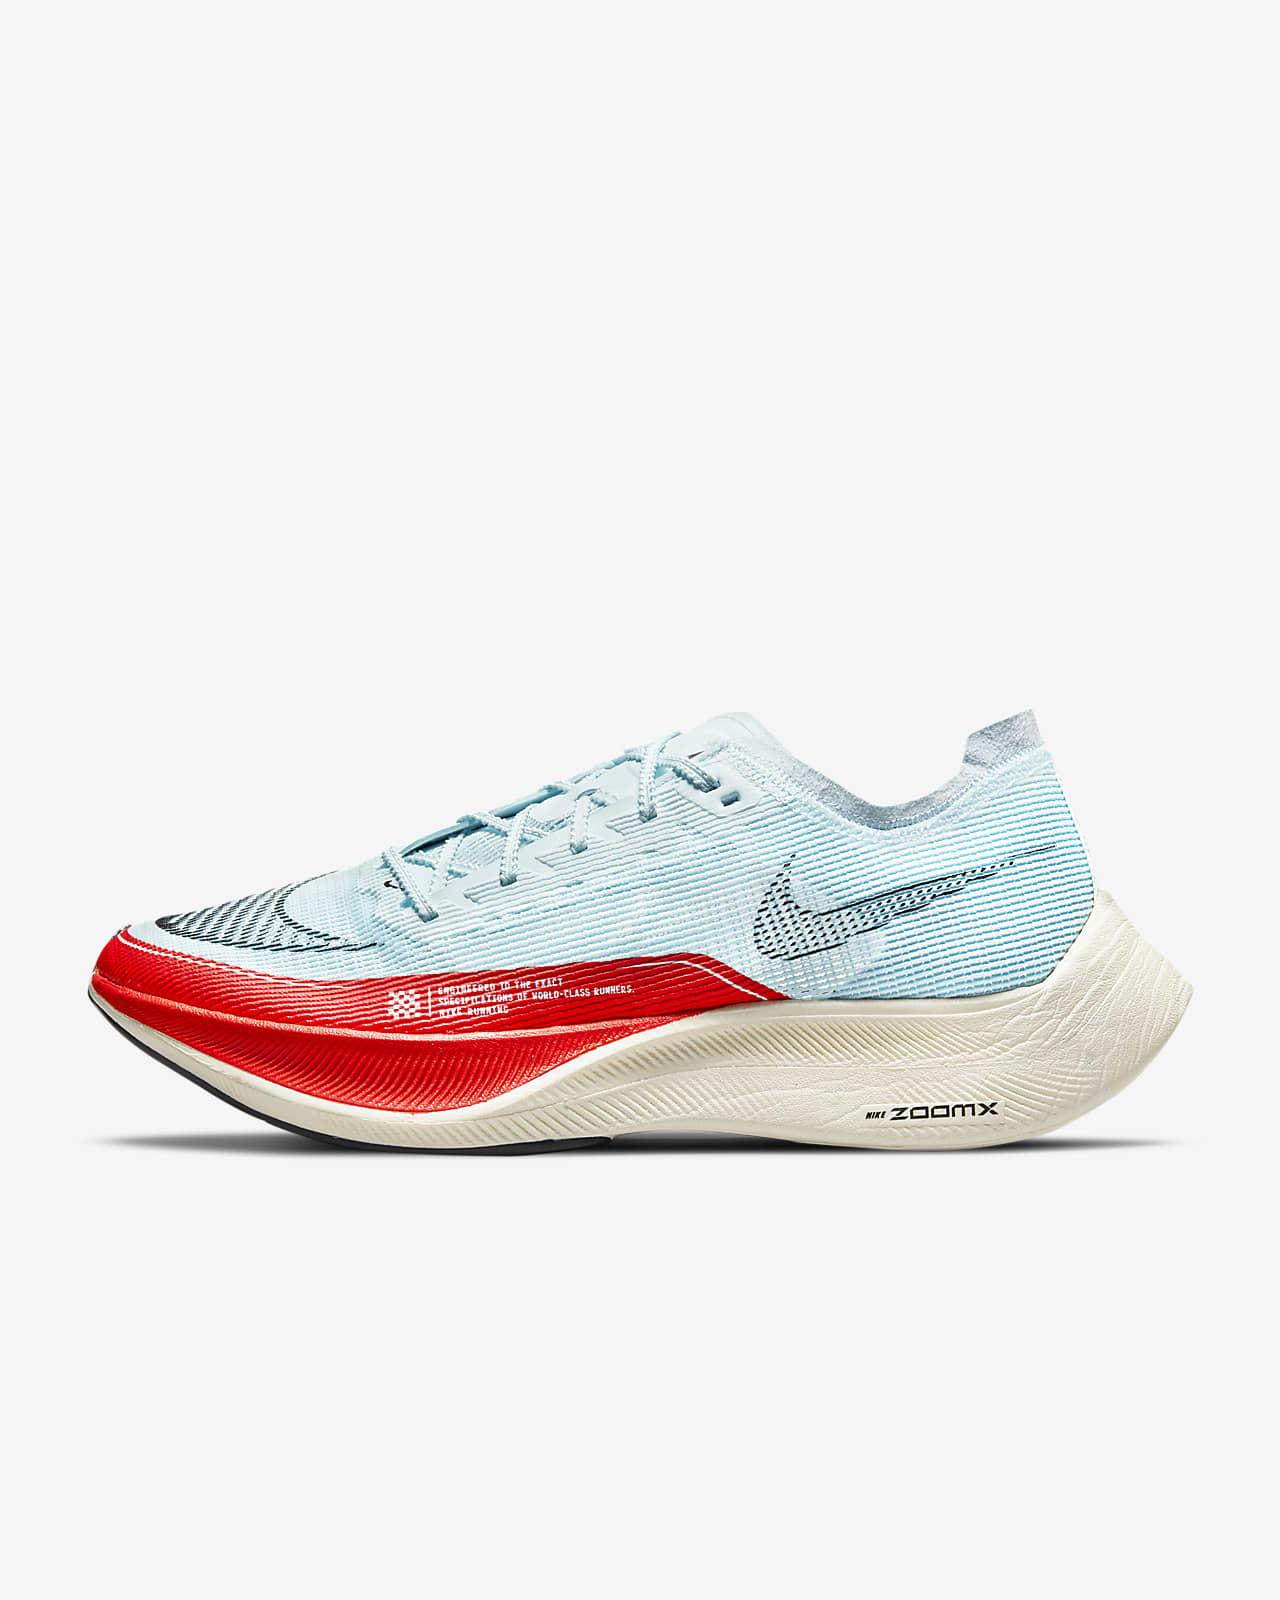 Chaussures de course Nike ZoomX Vaporfly Next% 2 « OG » pour Homme ...